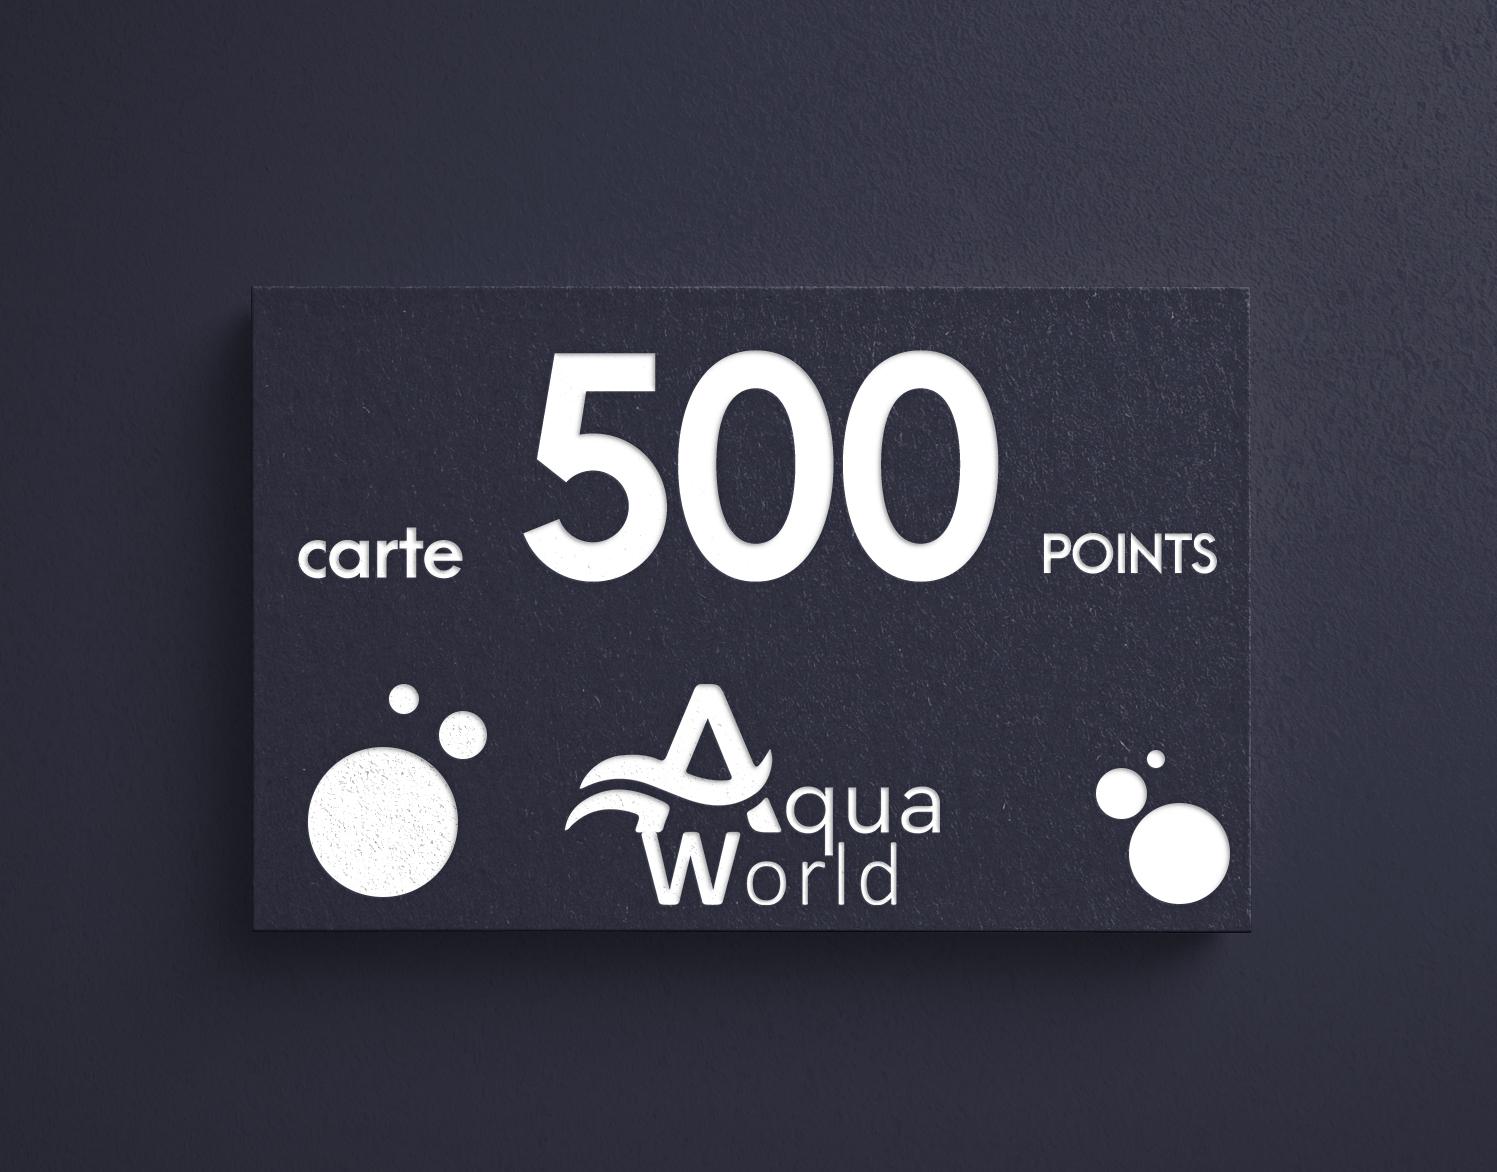 carte 500 points aquaworld